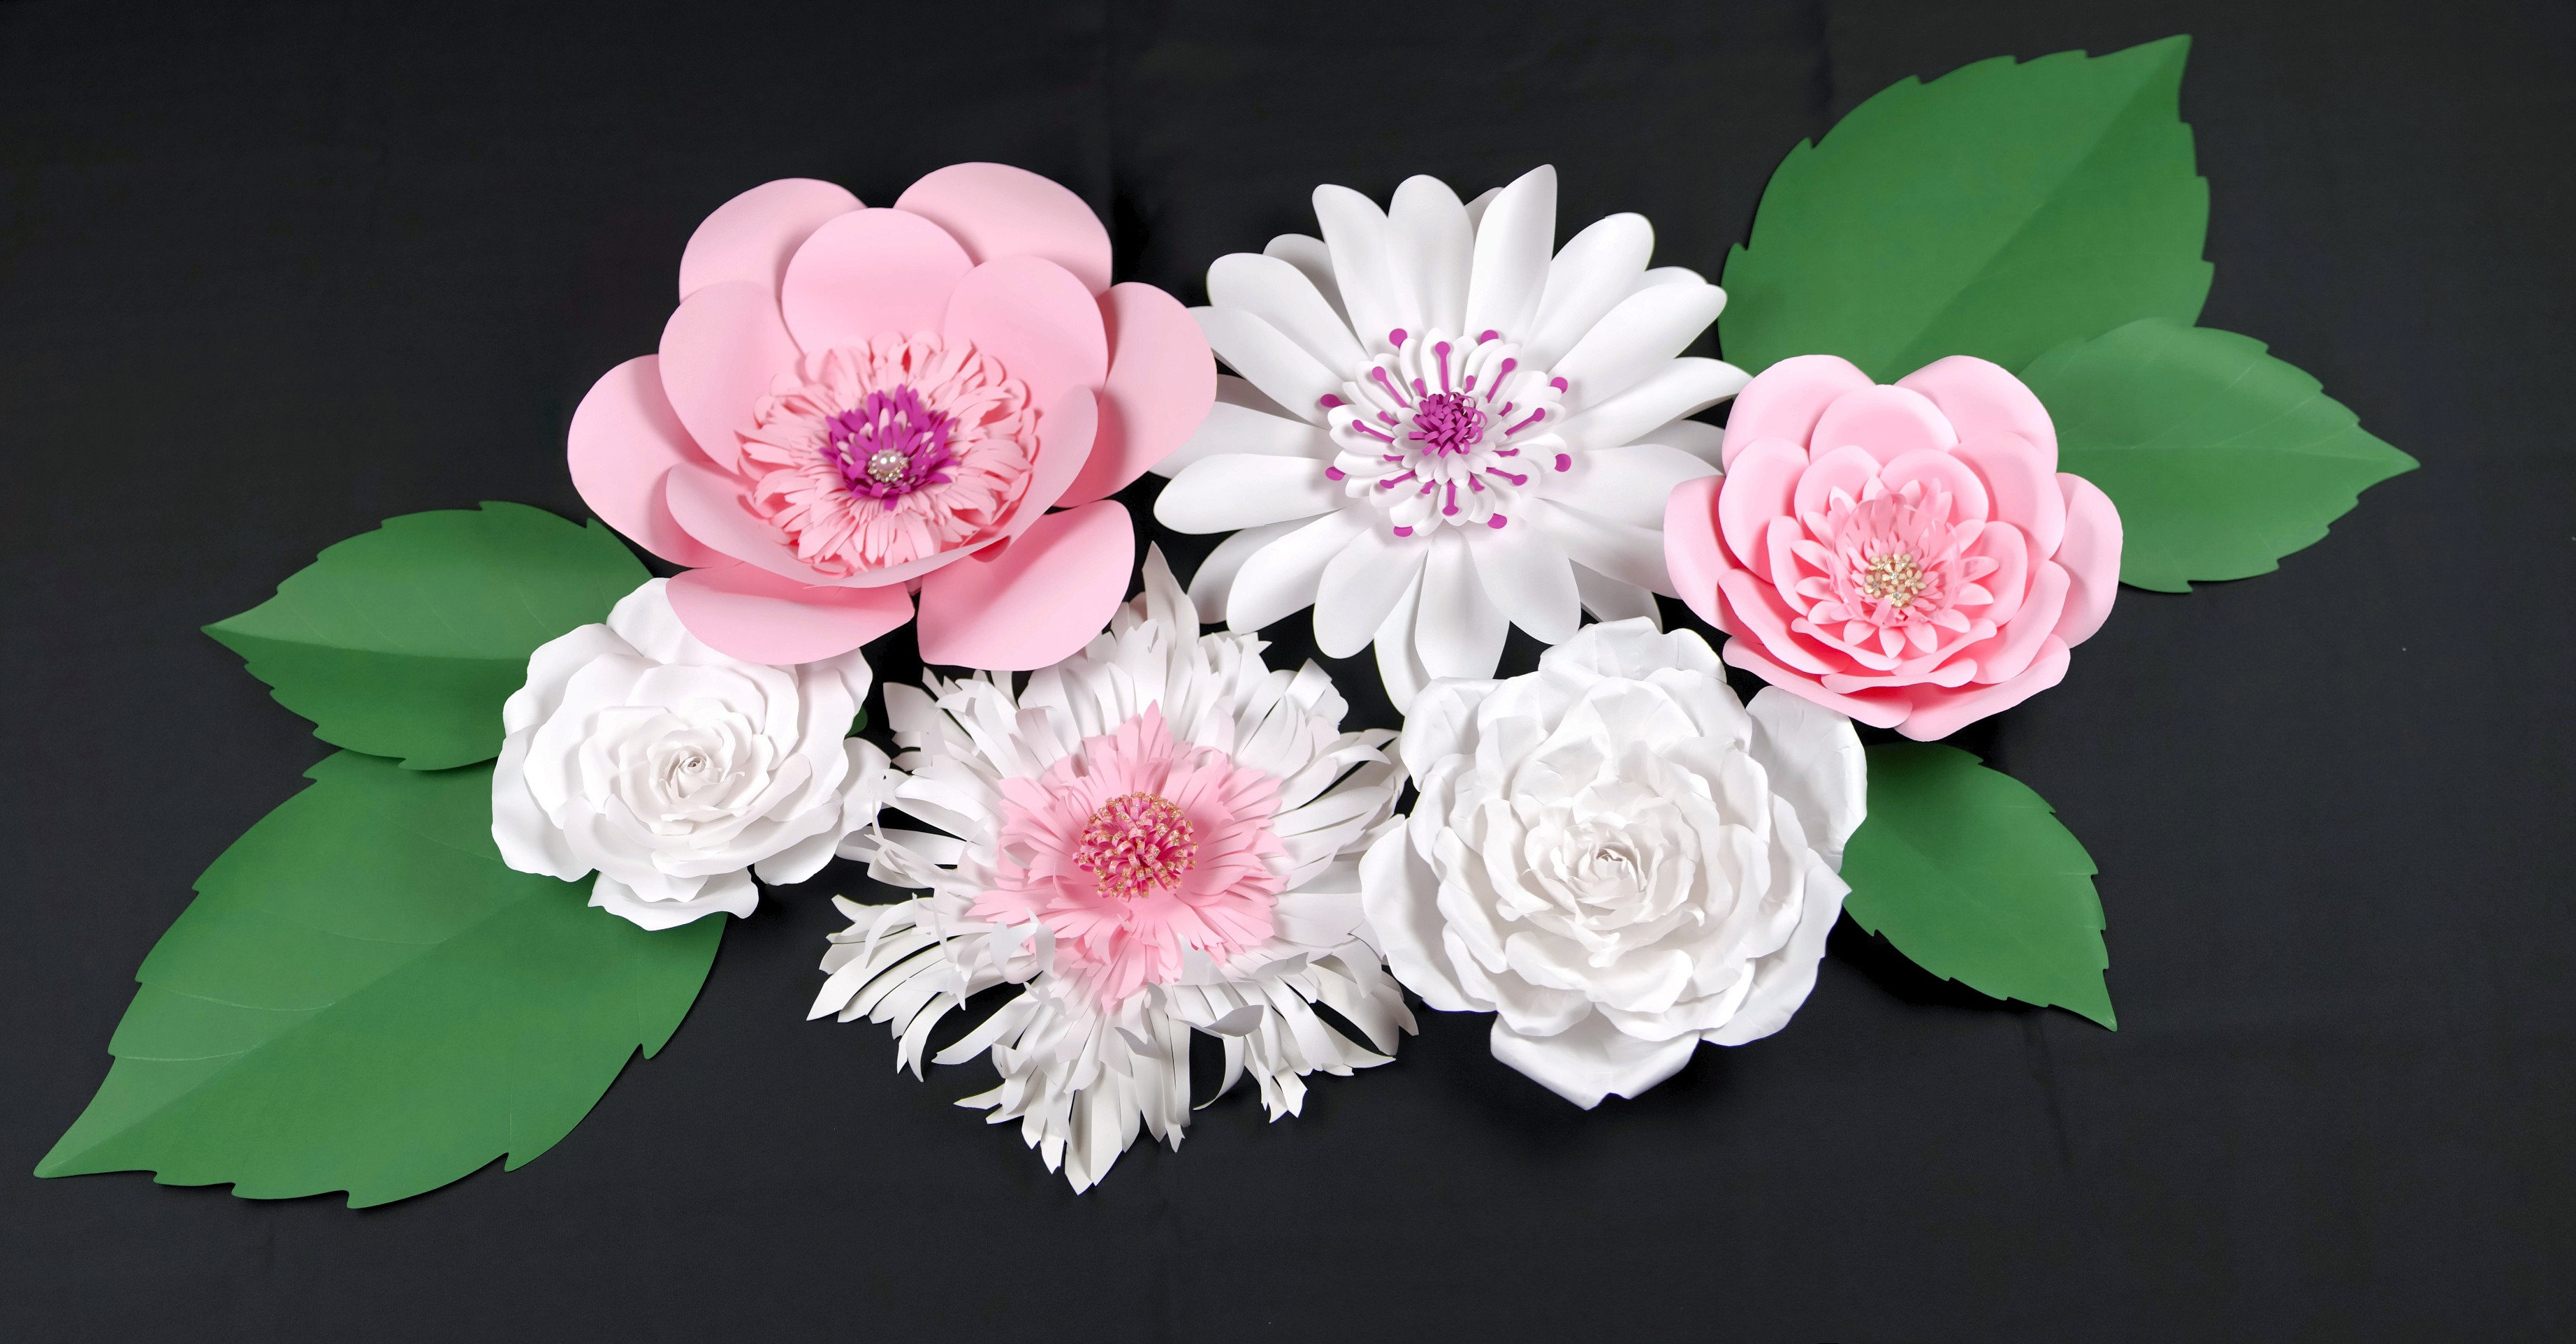 Handmade Giant Paper Flowers Wall Decoration Nursery Decor